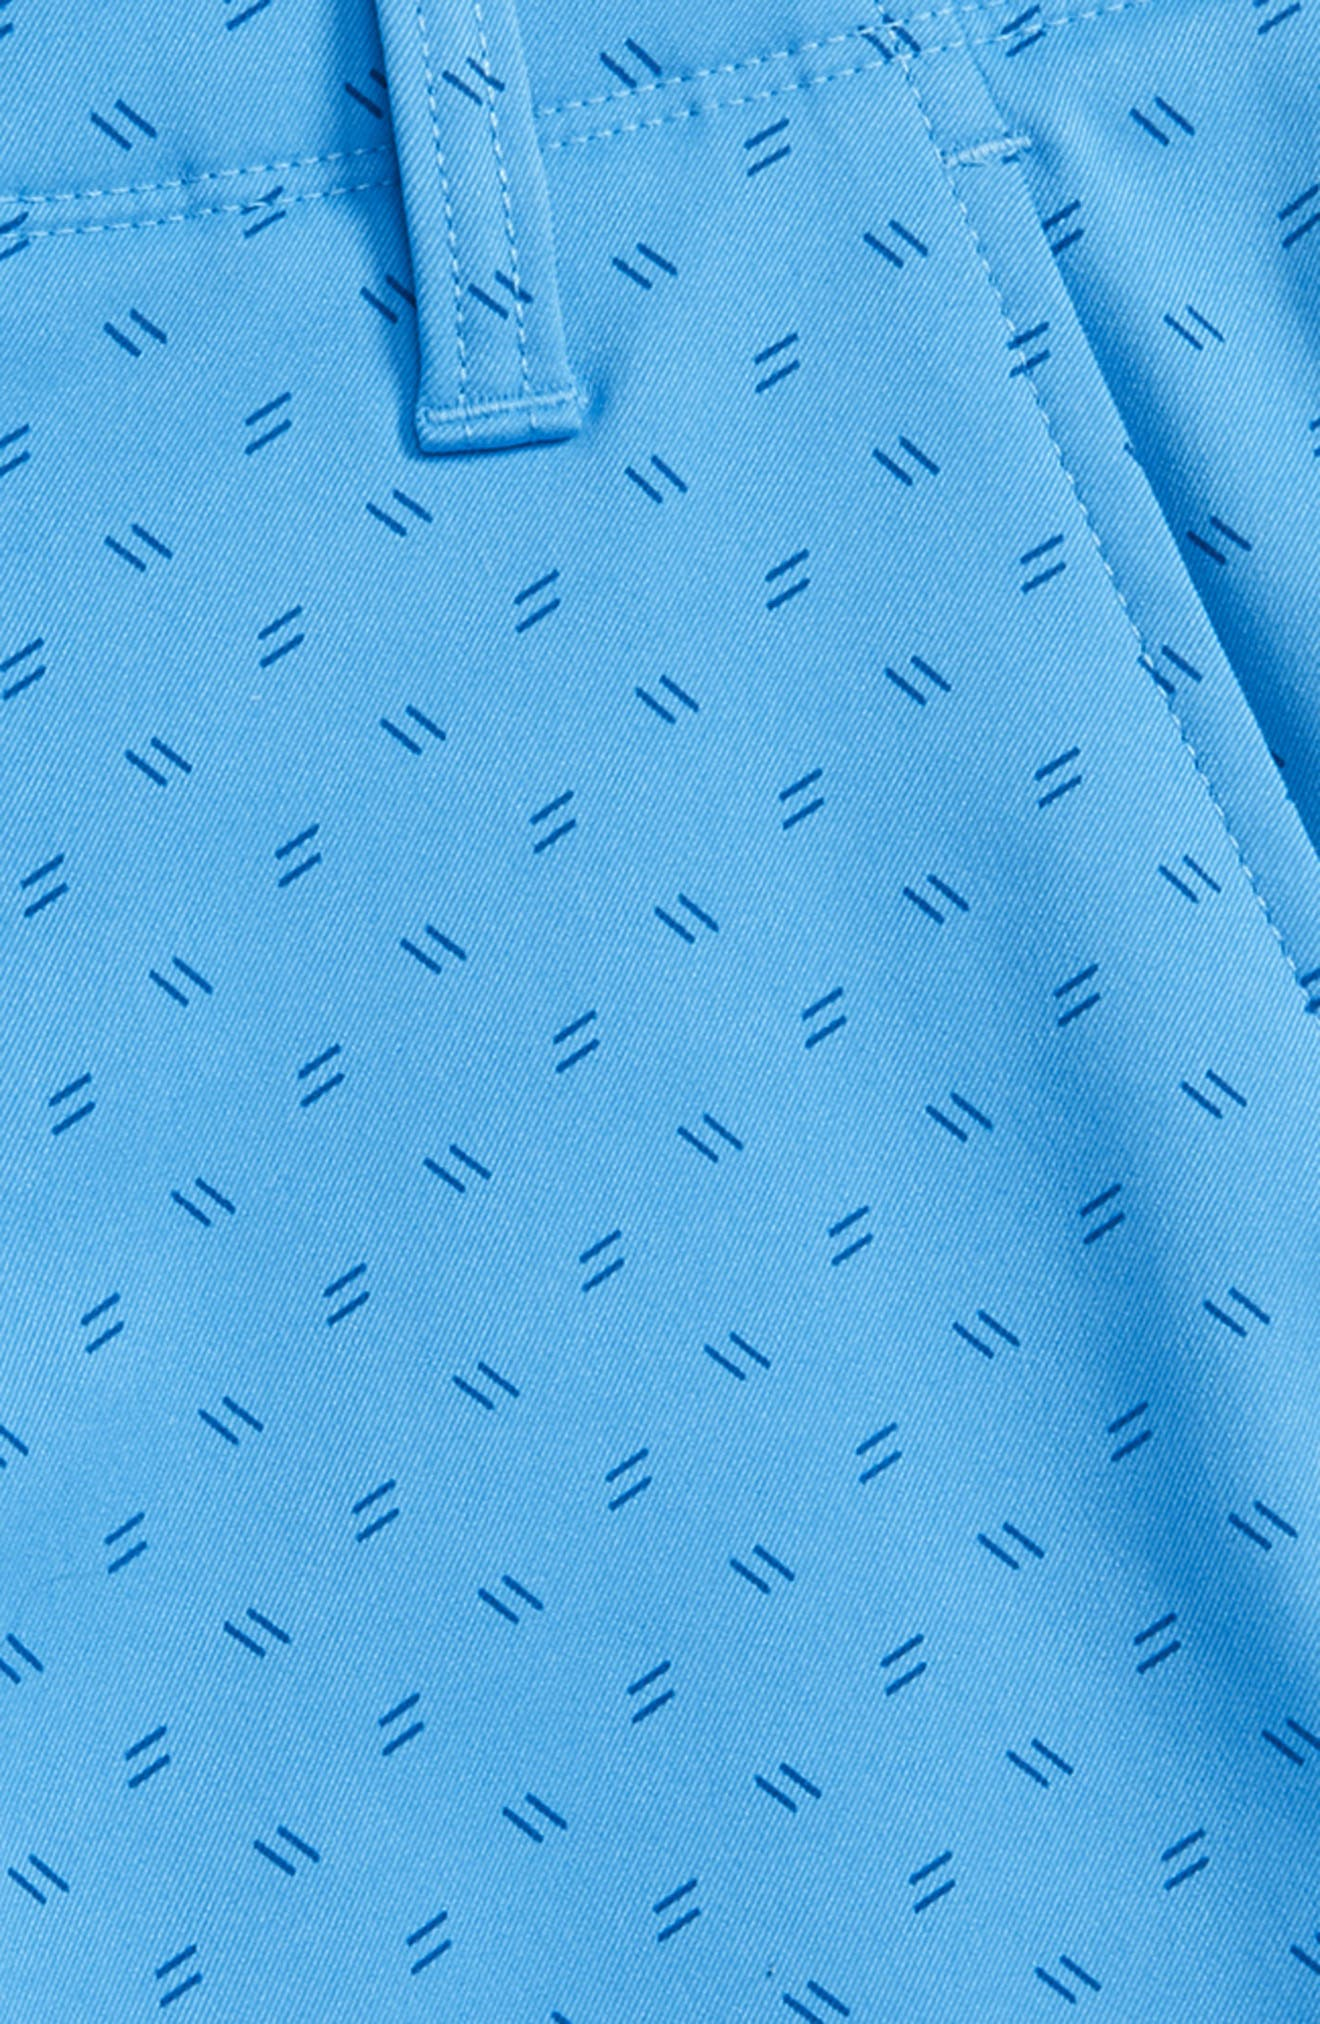 Match Play Golf Shorts,                             Alternate thumbnail 2, color,                             Canoe Blue/ Moroccan Blue